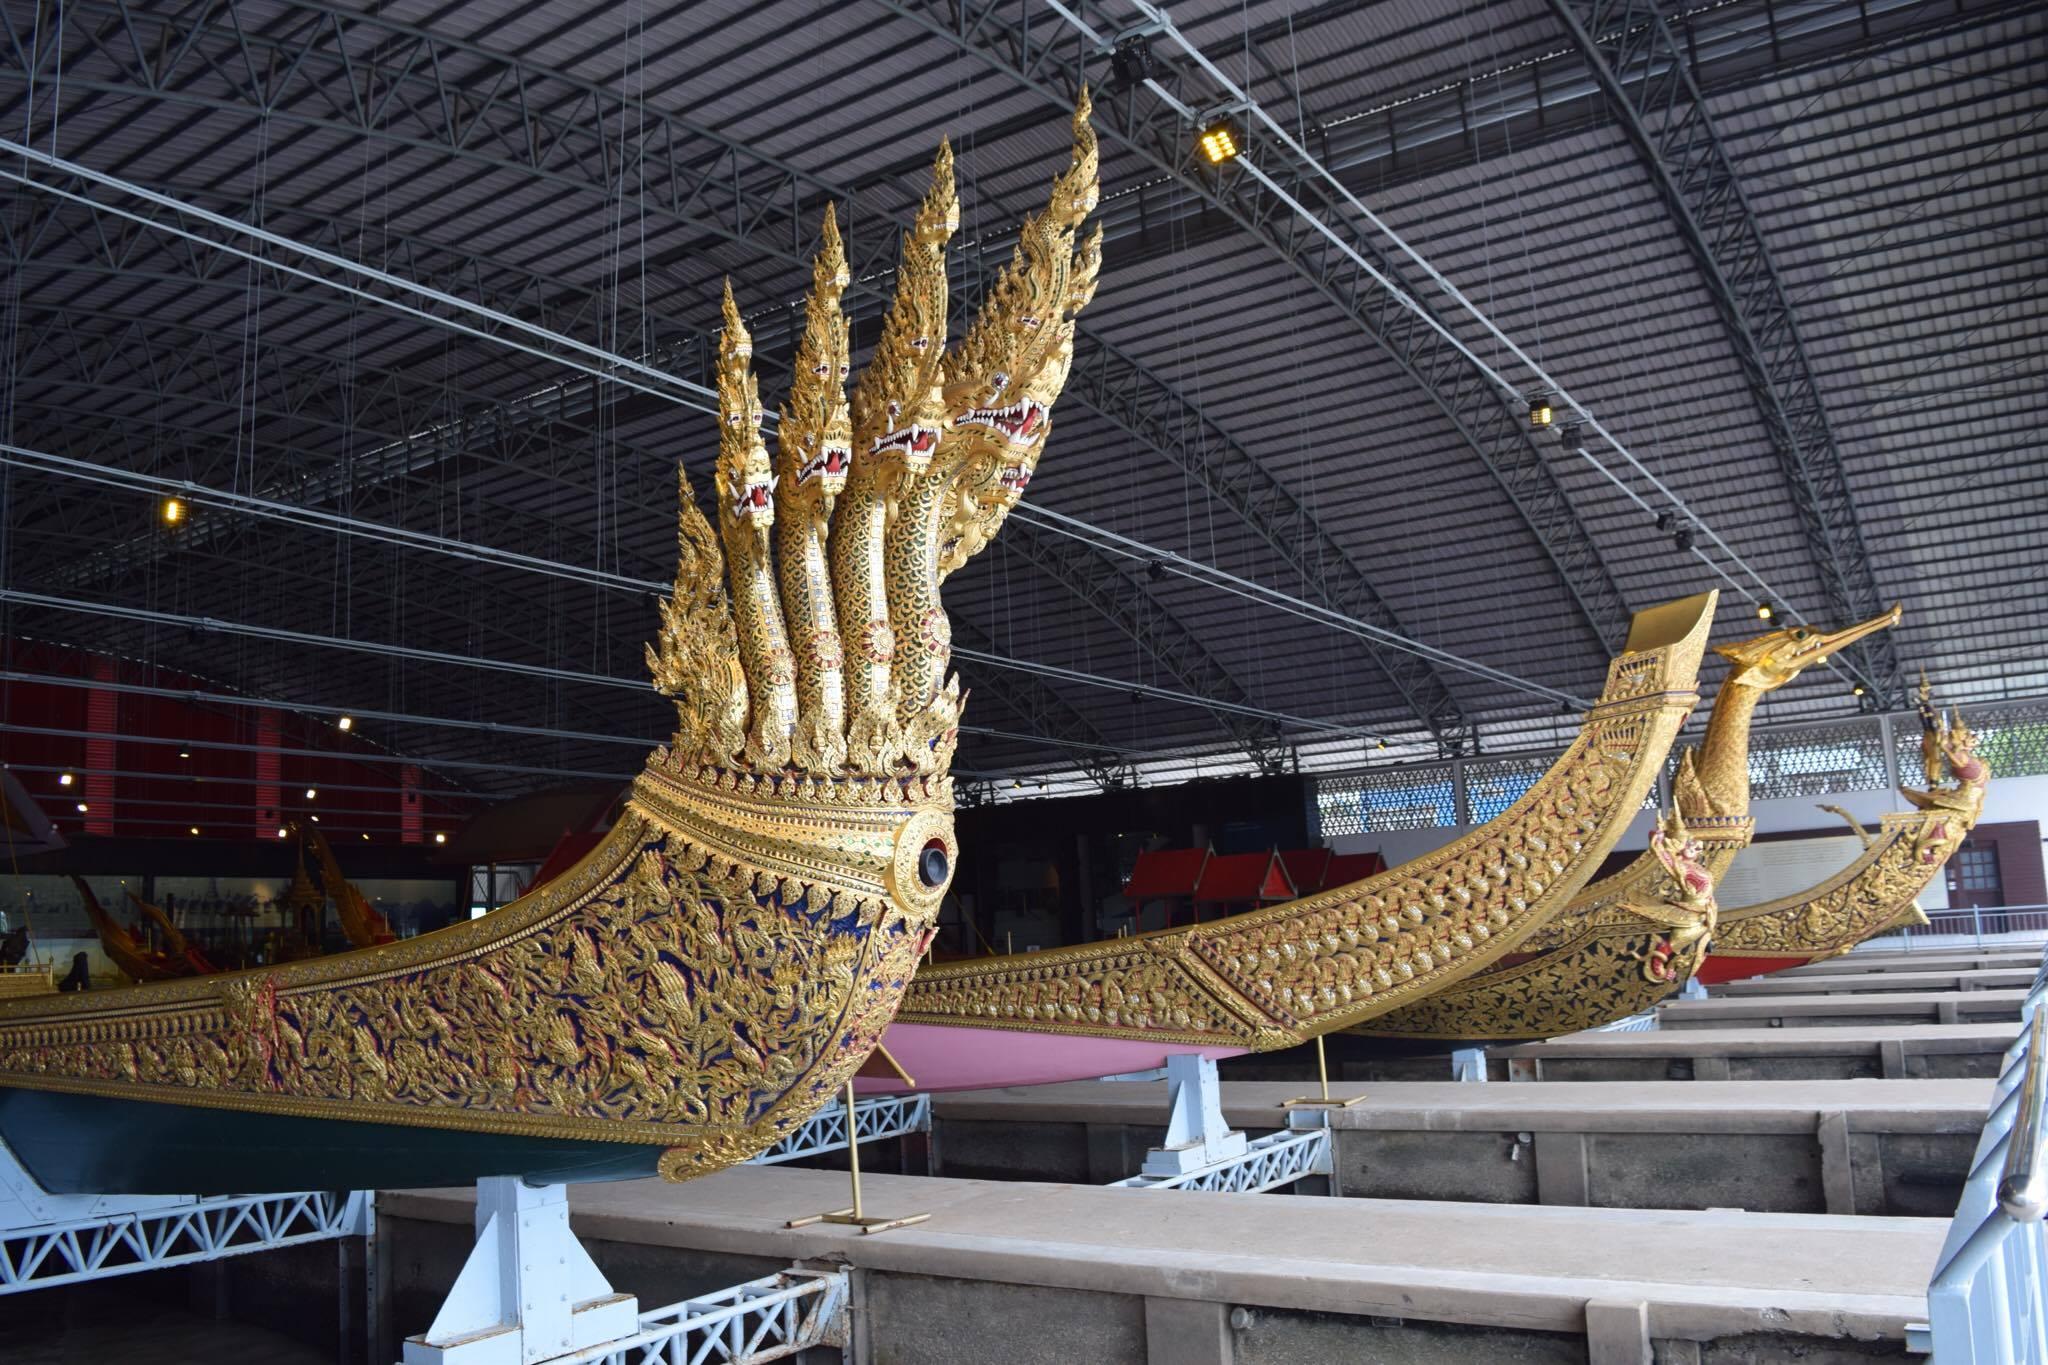 SILC Royal Barges